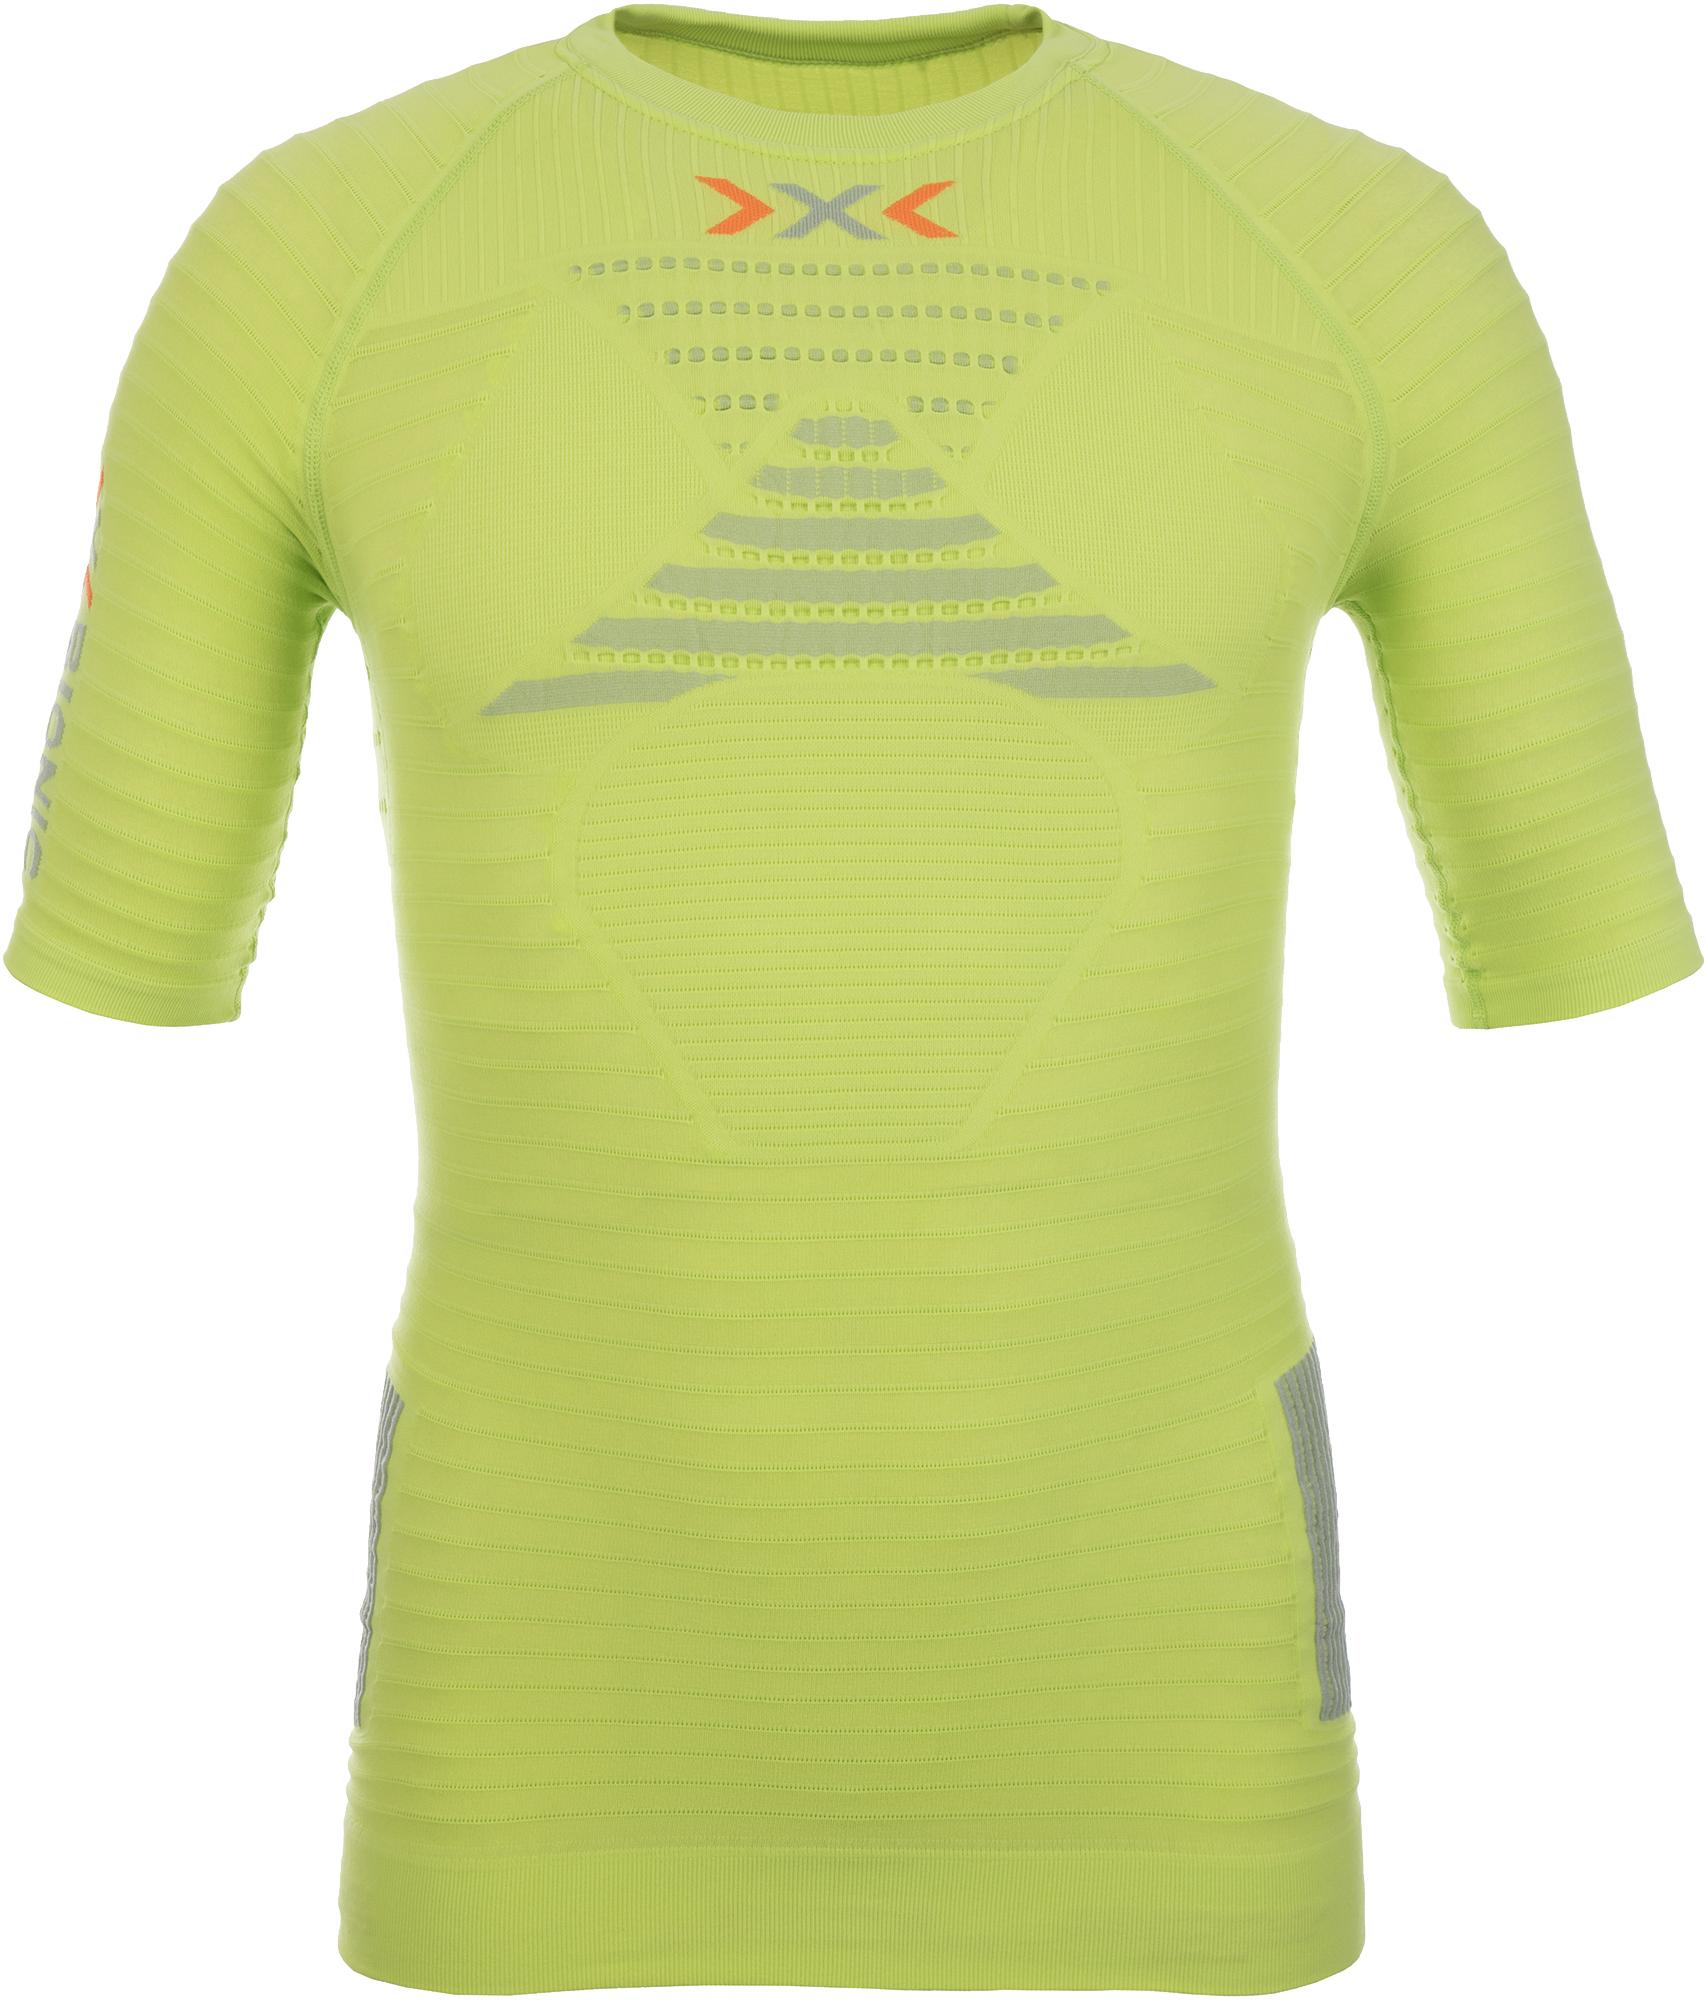 X-Bionic Футболка мужская X-Bionic Effector Power Ow, размер 54 футболка x bionic x bionic effektor running powershirt®